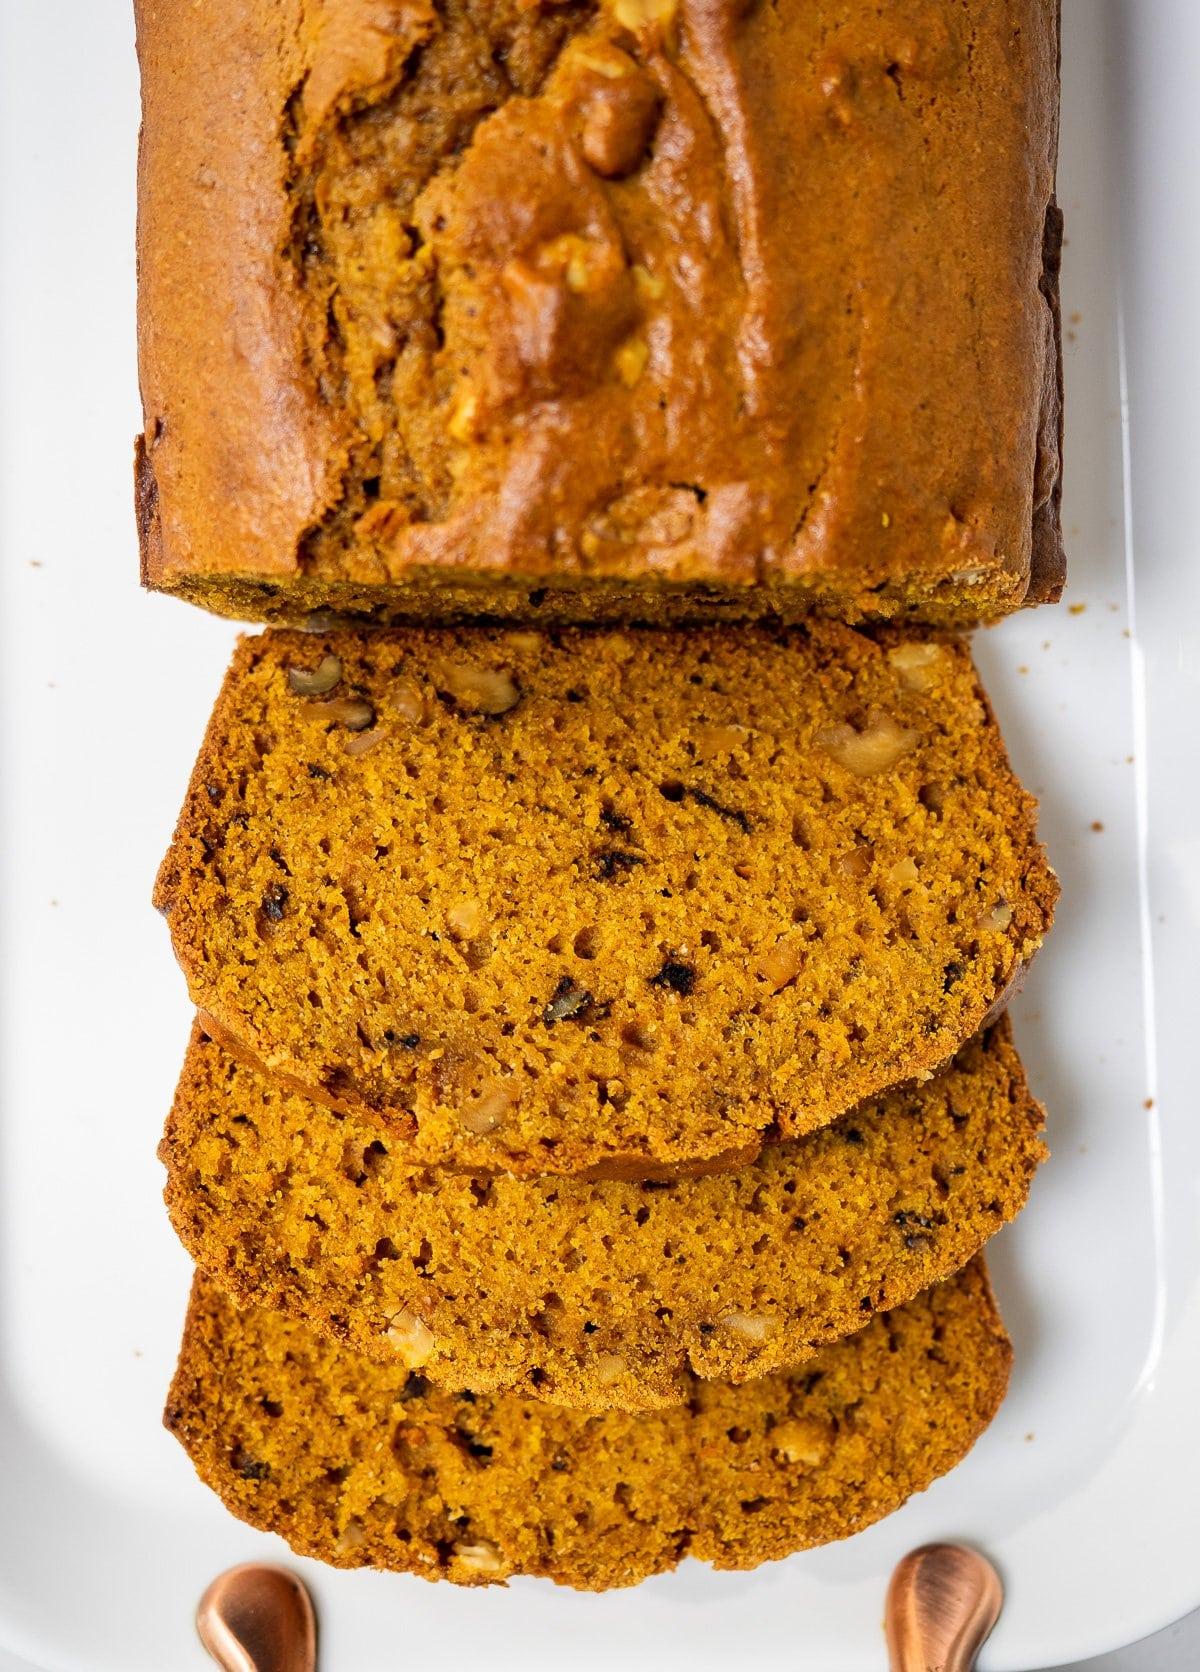 Top view of a partially sliced pumpkin bread.